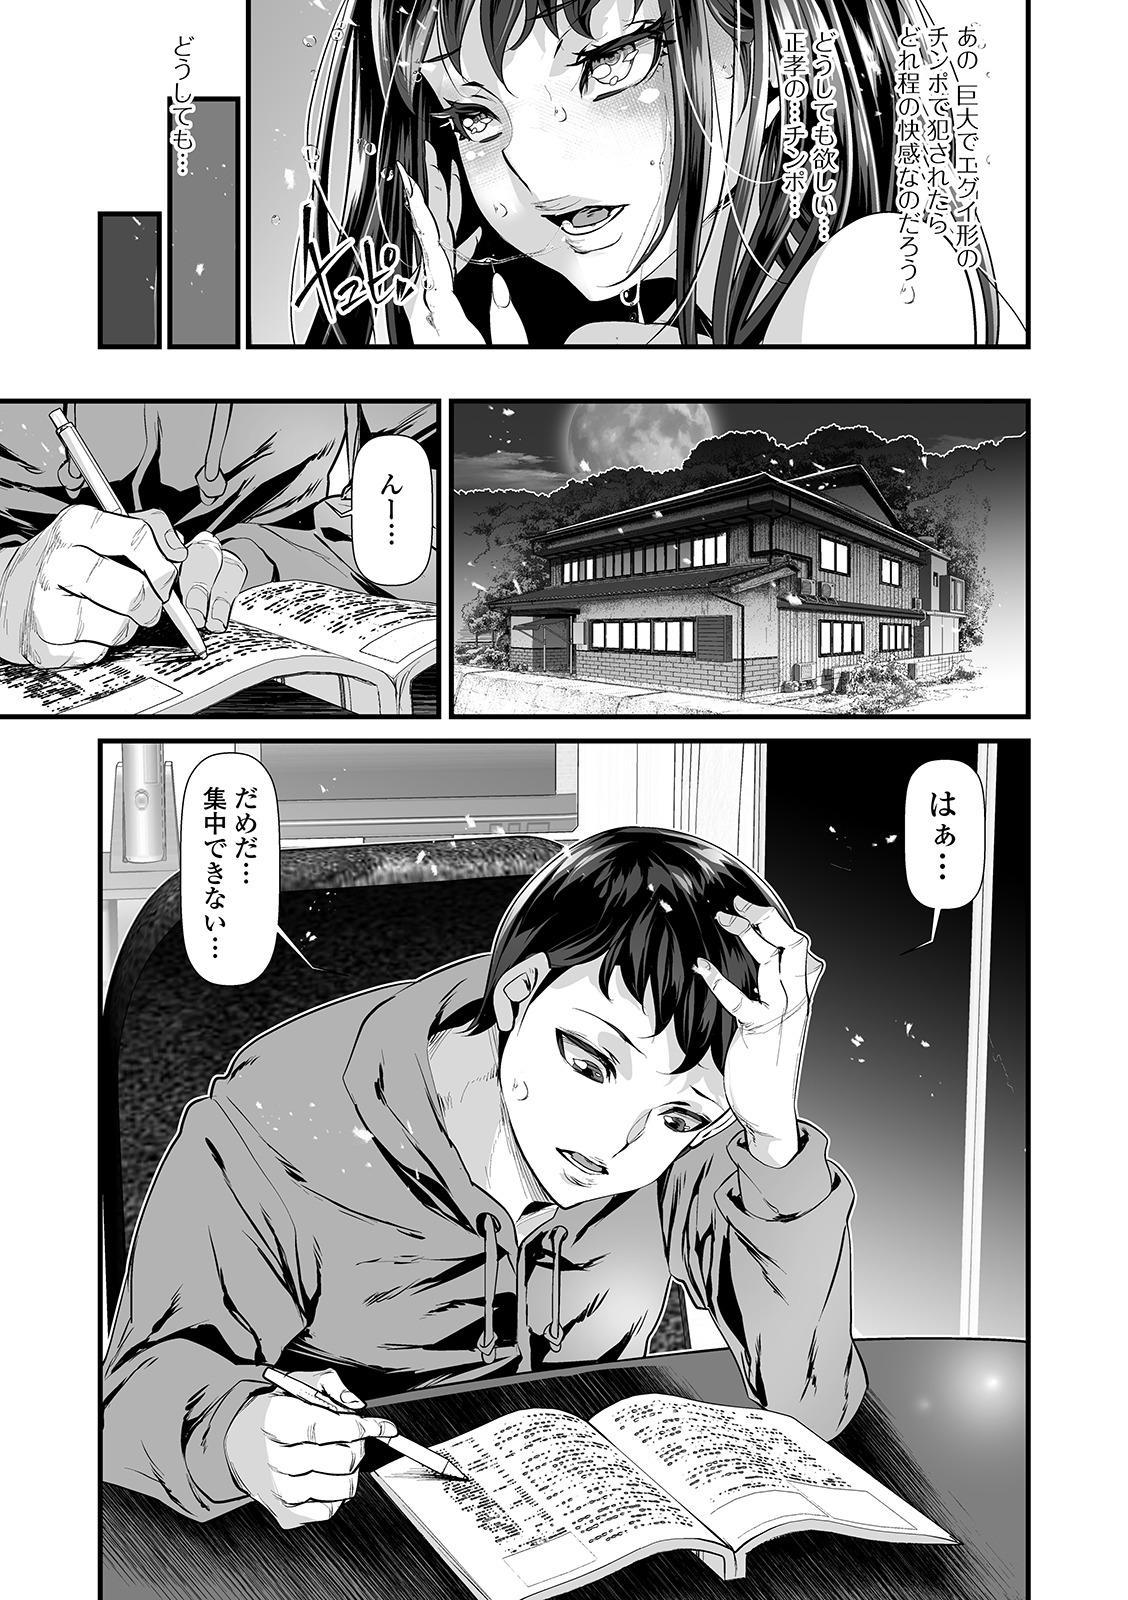 COMIC Shigekiteki SQUIRT!! Vol. 15 16